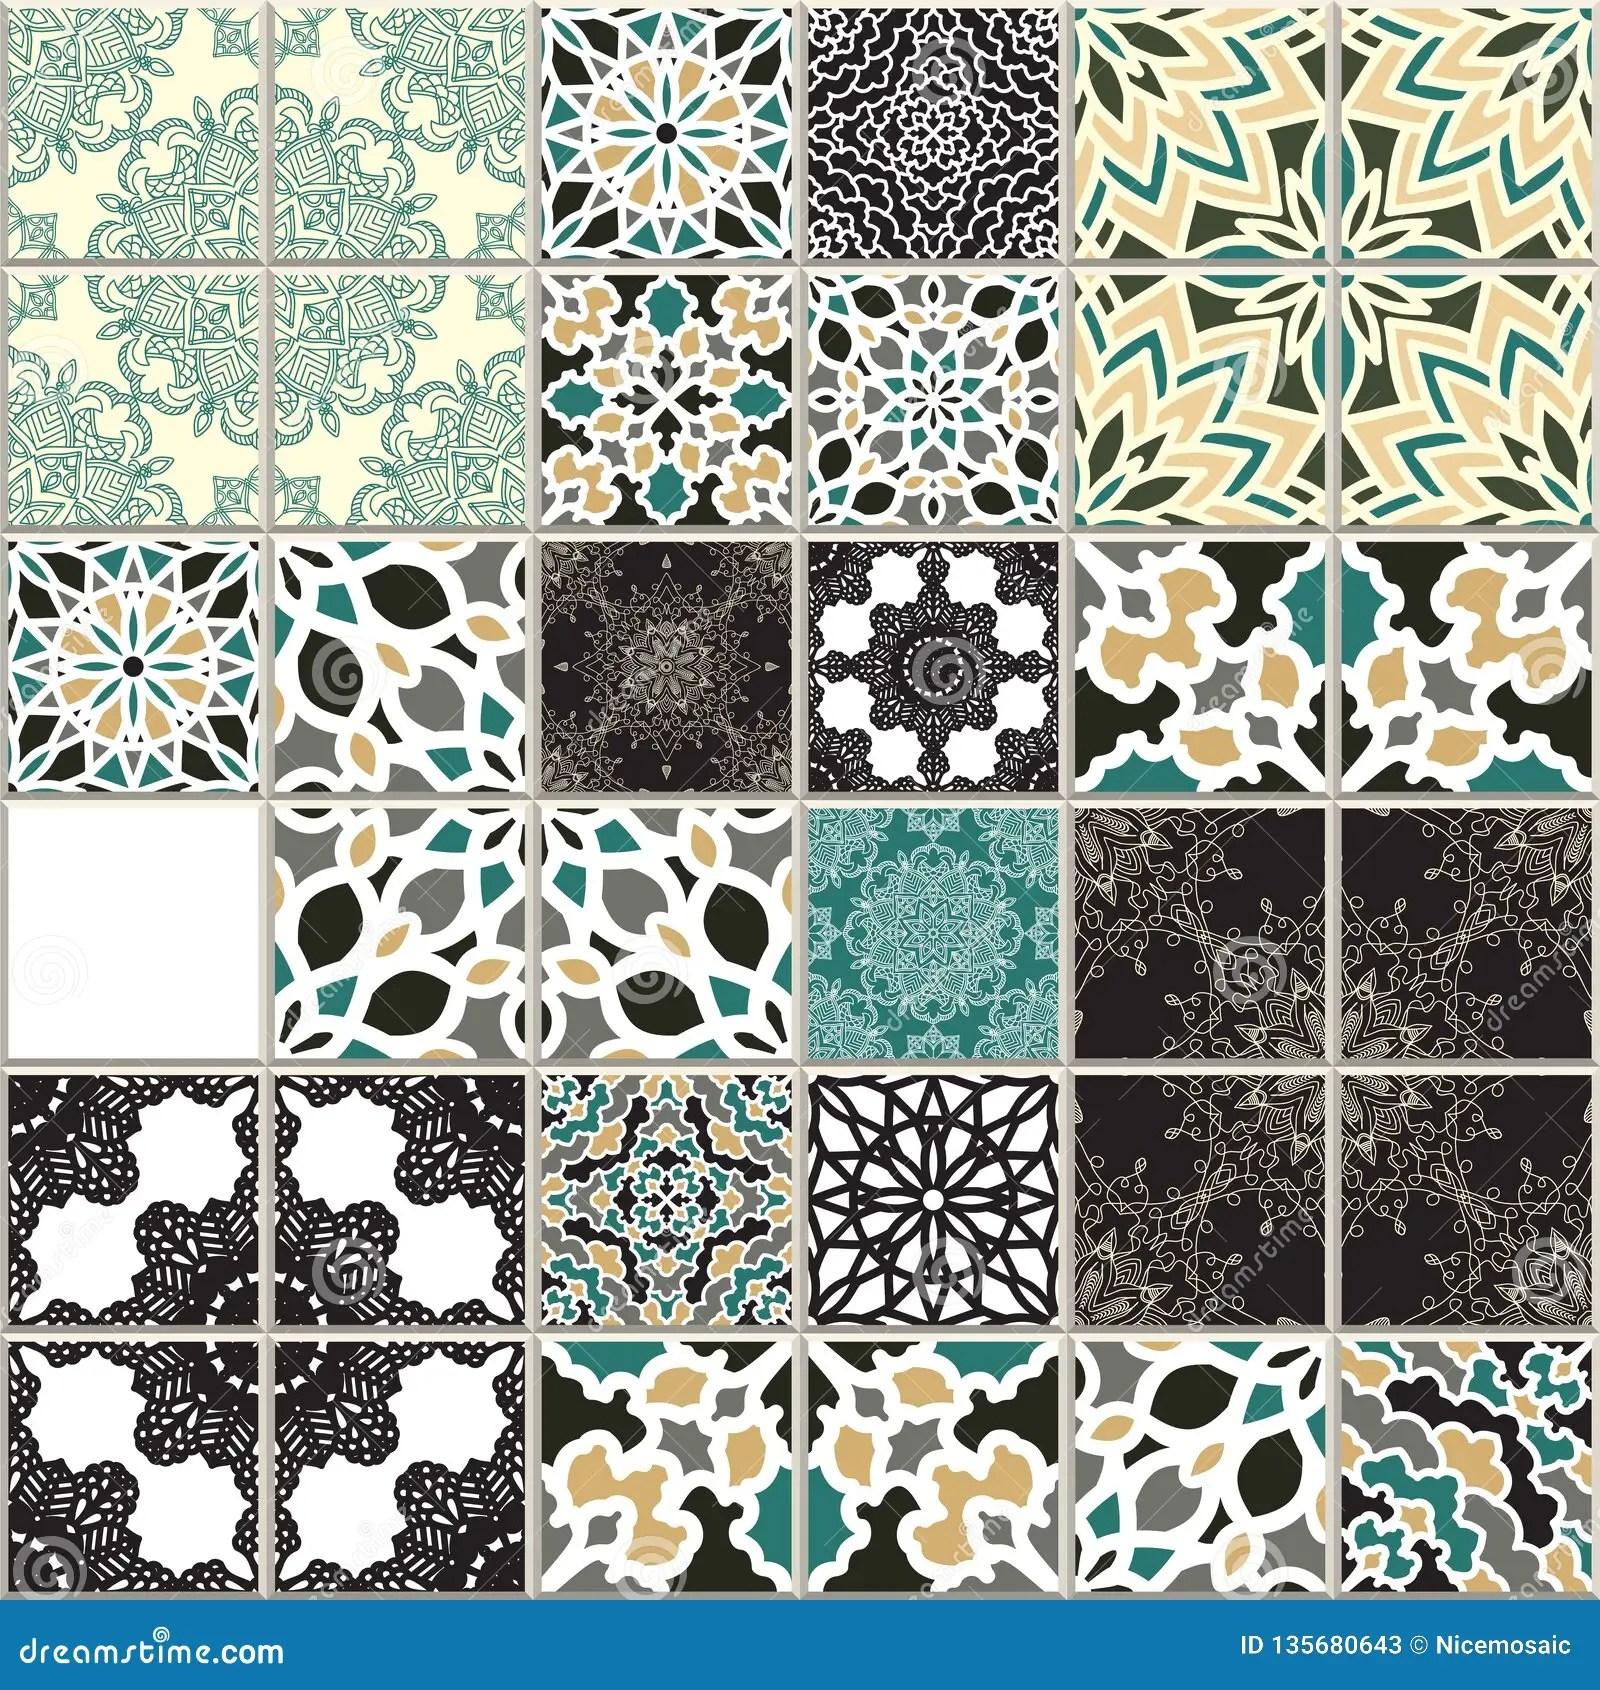 https www dreamstime com vector seamless pattern template design wallpaper vinyl wallpapers pvc pattern peel stick wall tile decals self adhesive image135680643